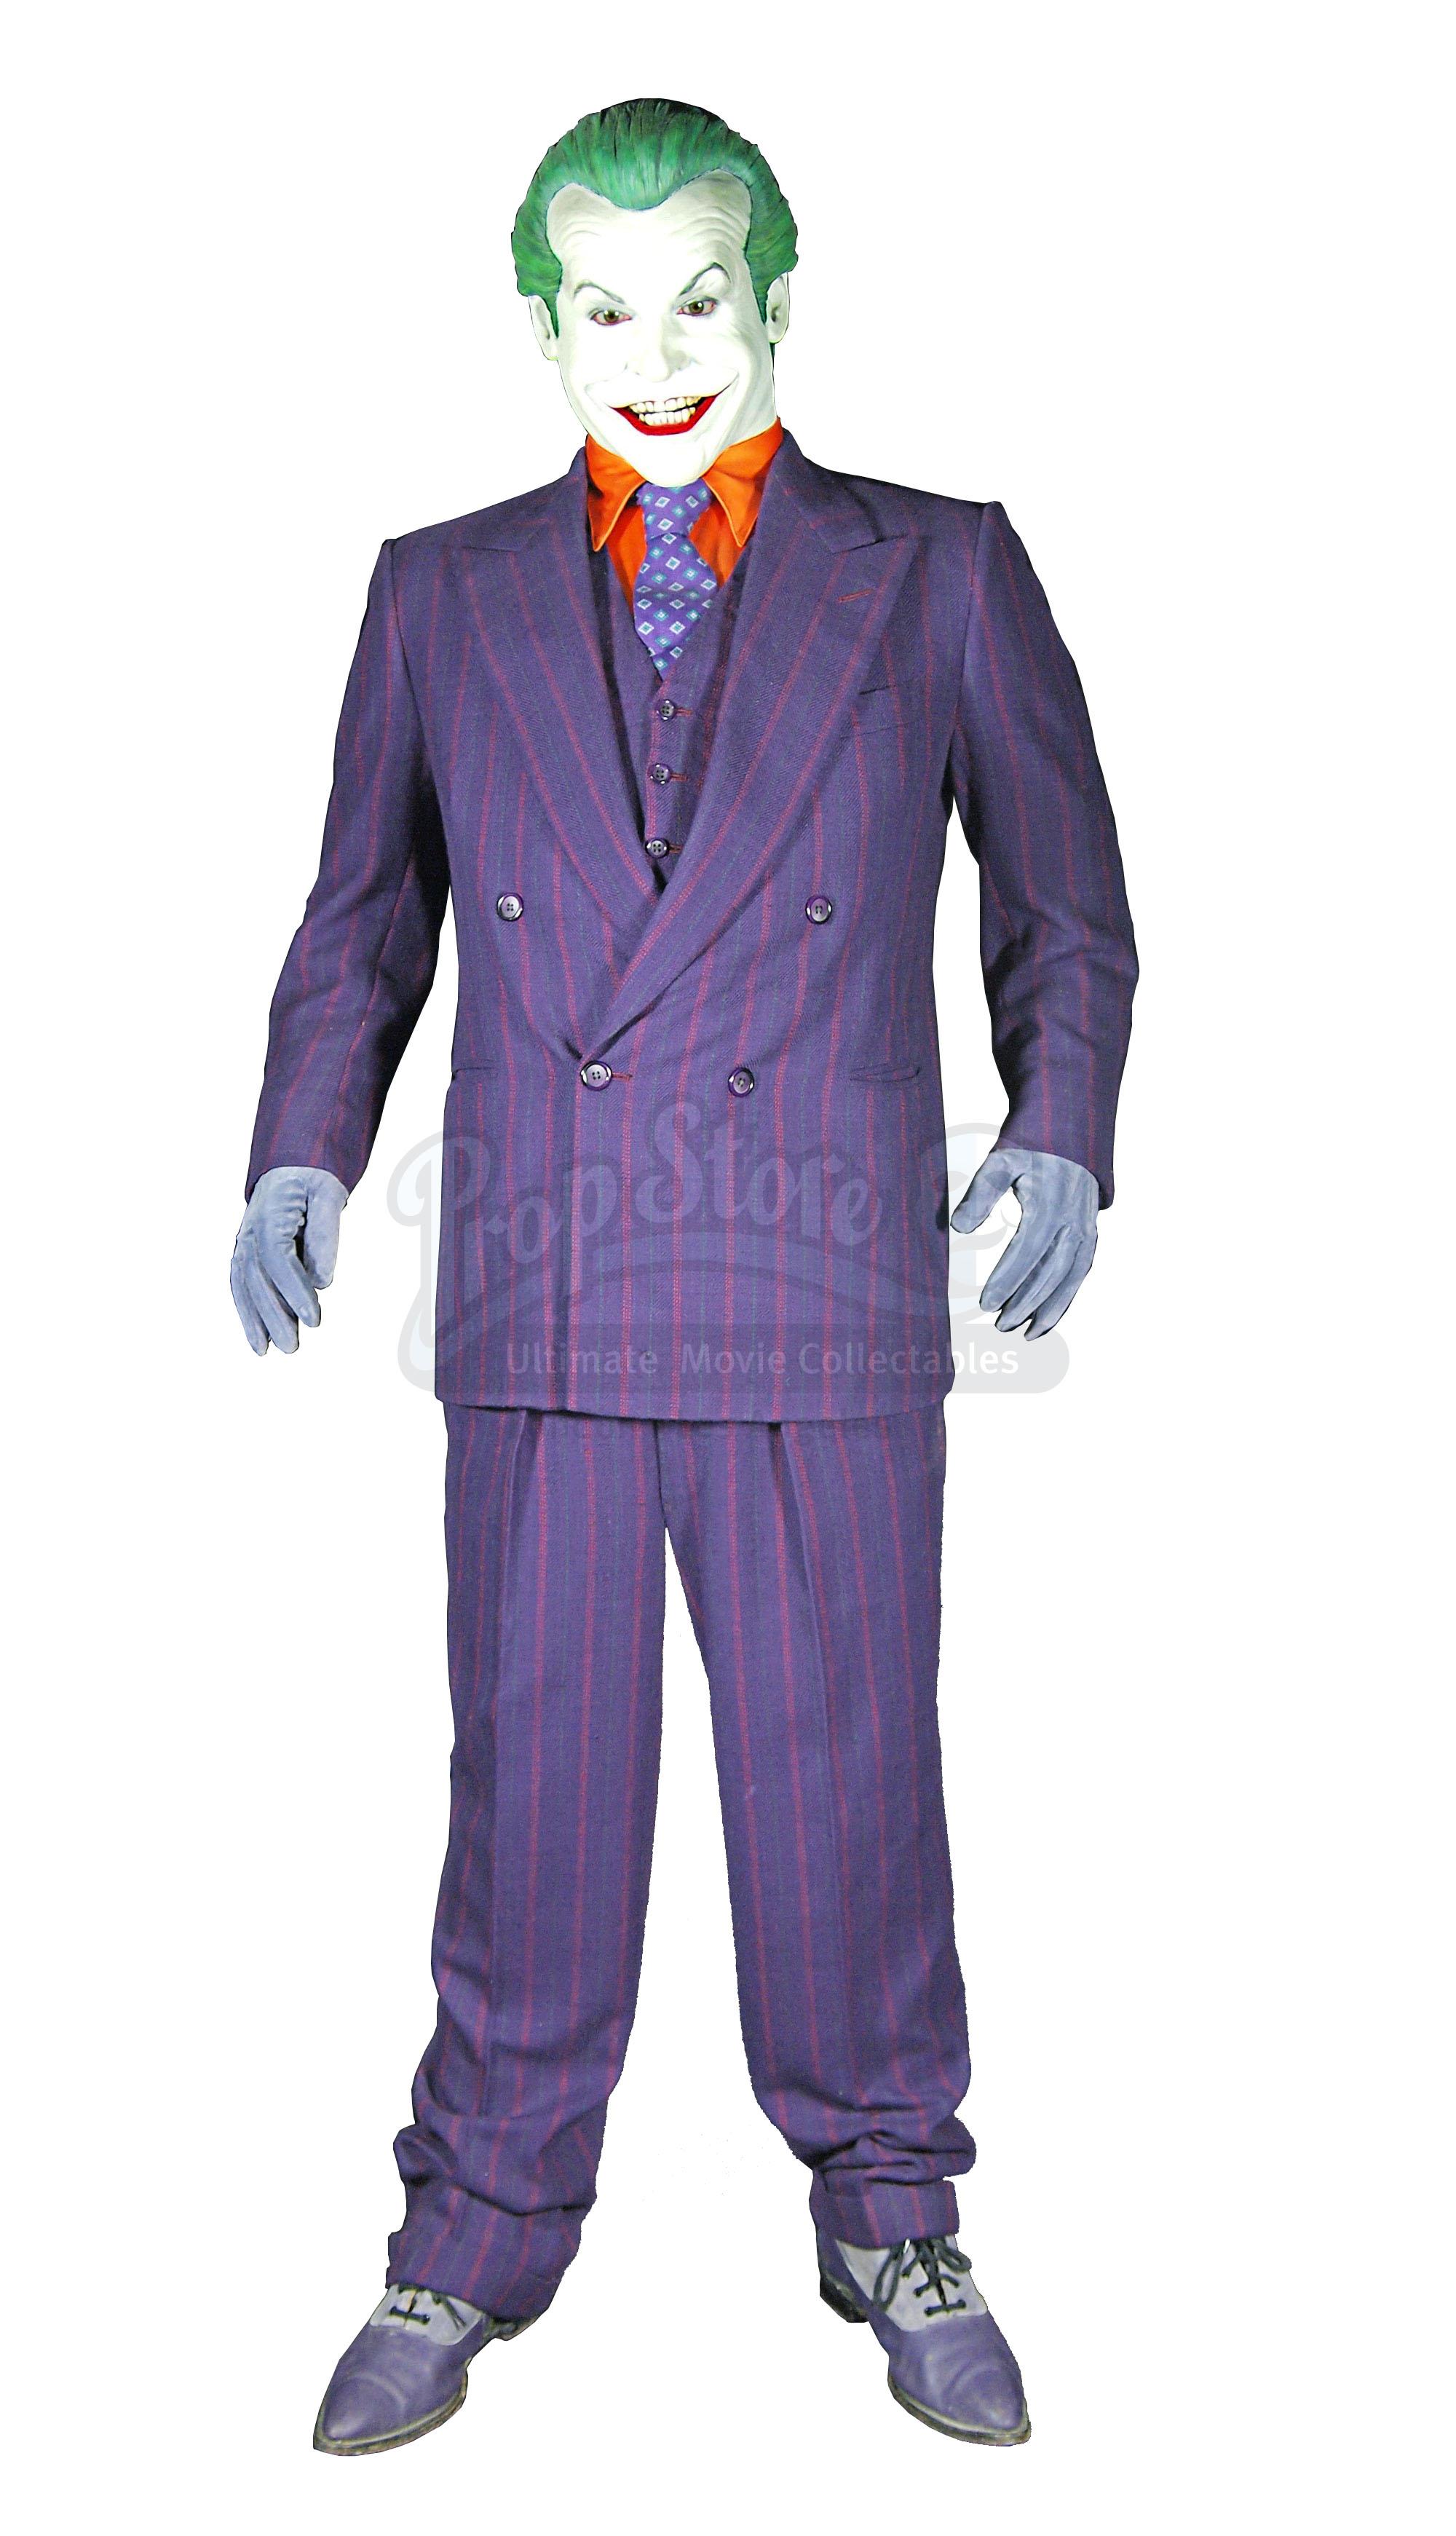 the gallery for gt jack nicholson joker costume